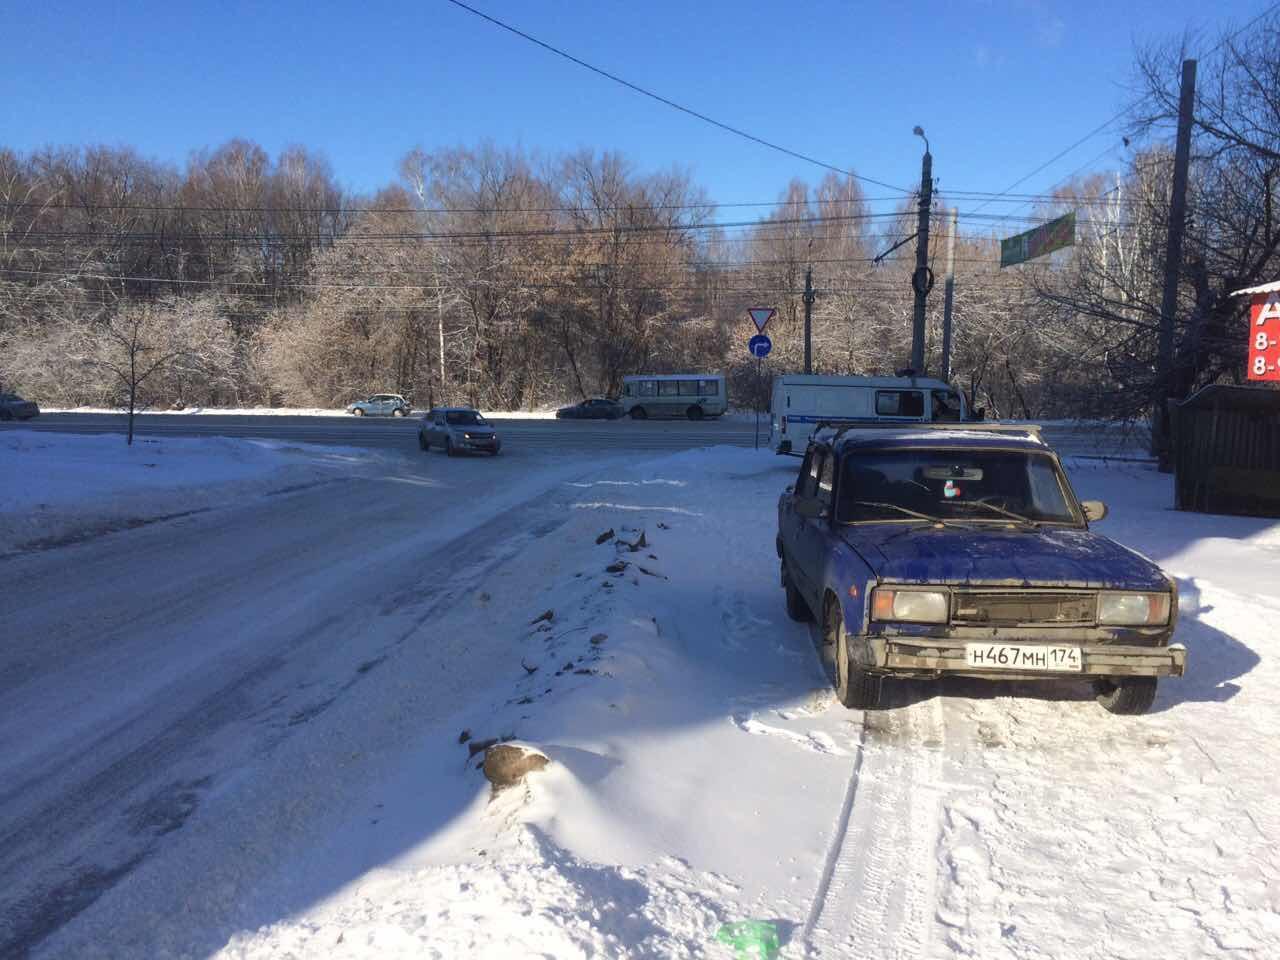 ВАЗ сбил пенсионерку натротуаре вСоветском районе